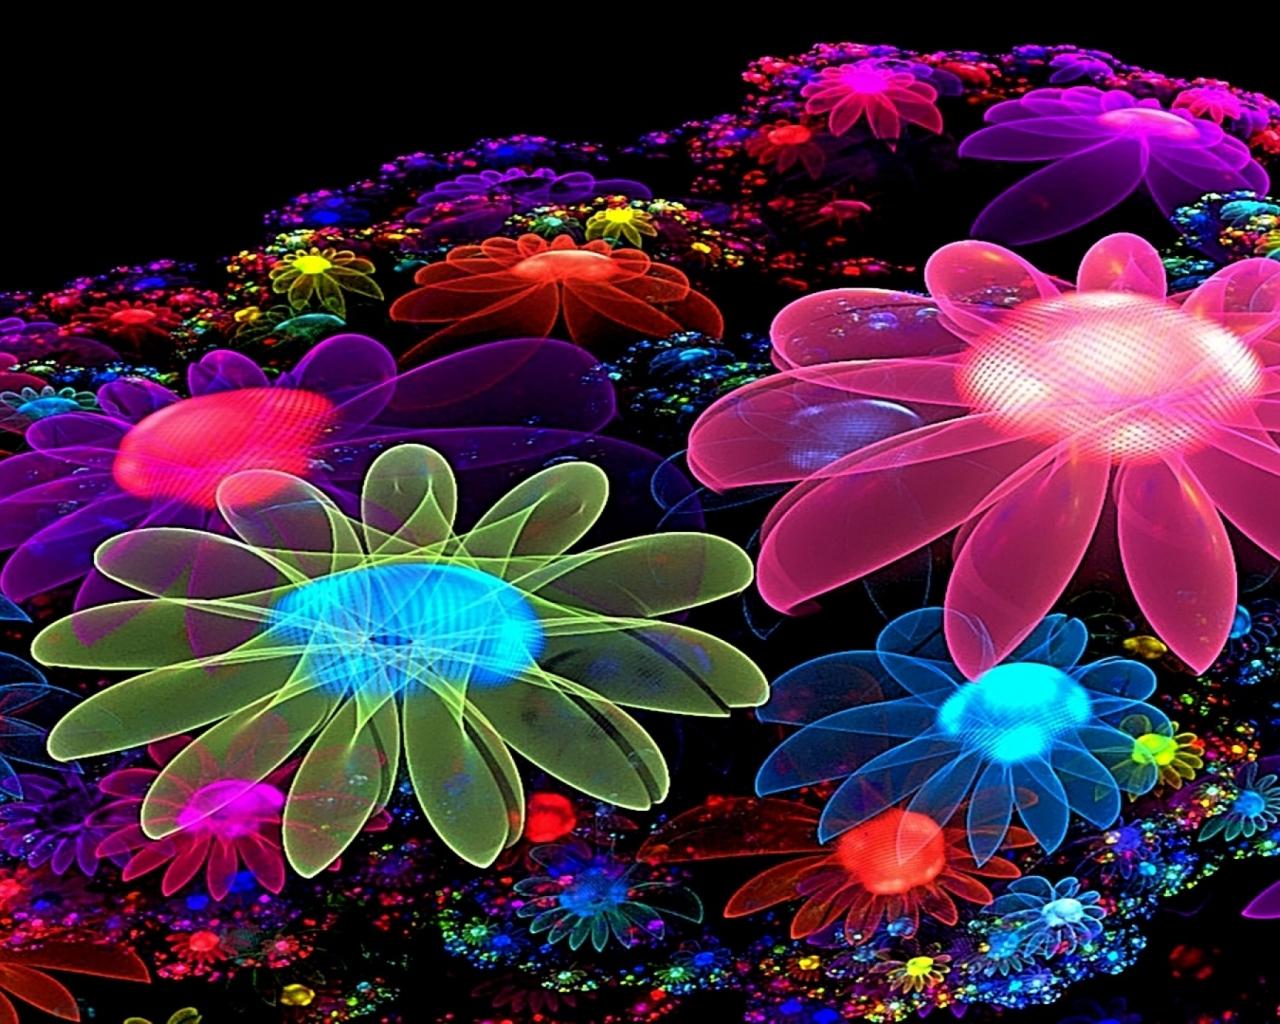 Free Colorful Flower Wallpaper Downloads: Glowing Flower Wallpapers